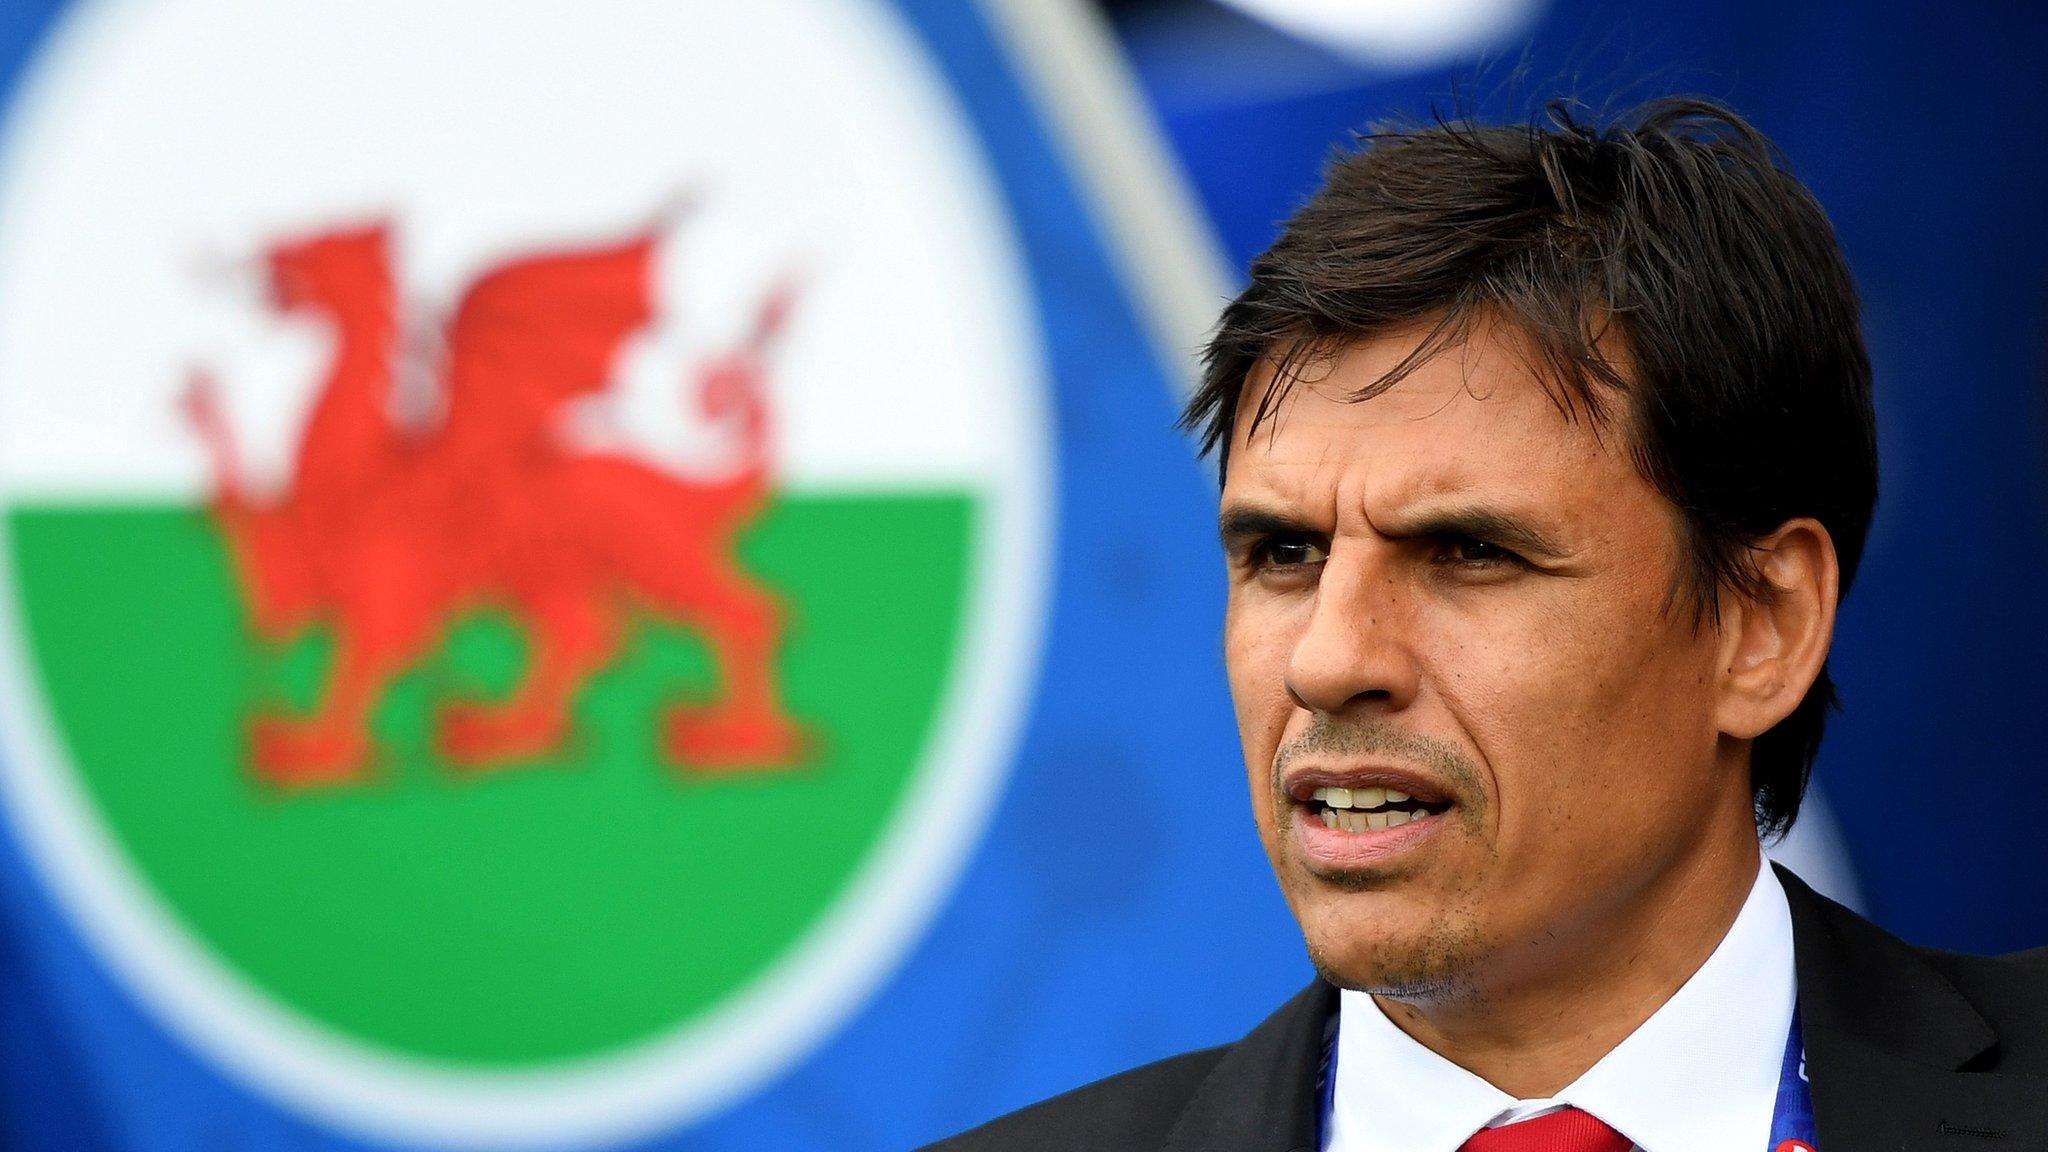 Euro 2016: Wales success no shock says manager Chris Coleman